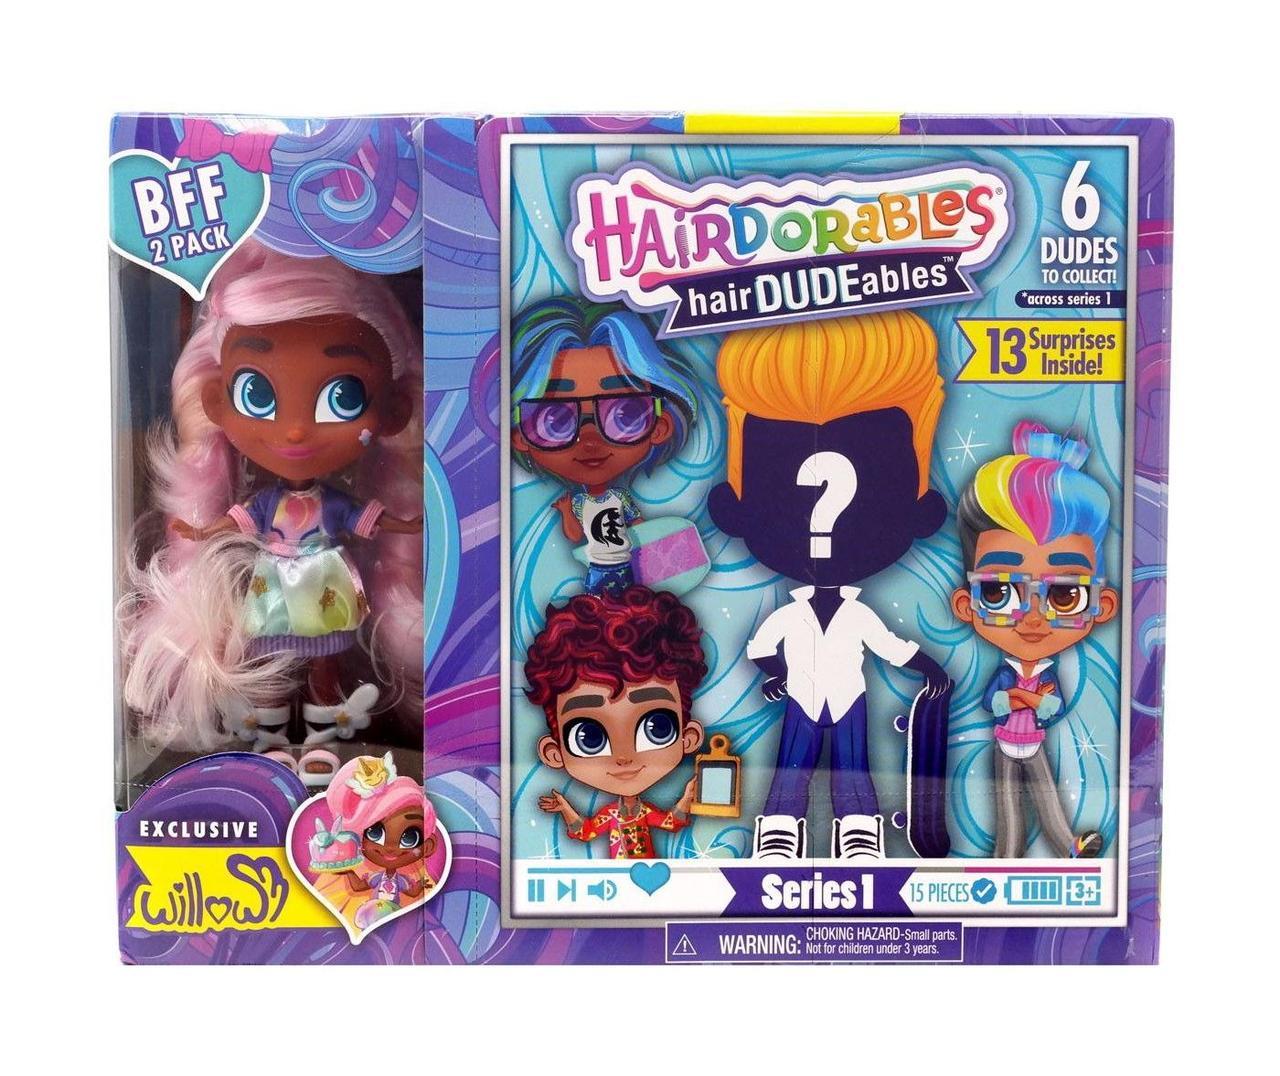 Набор-сюрприз Hairdorables мальчик и девочка Willow | Набор 2 куклы He and She Хэрдораблс